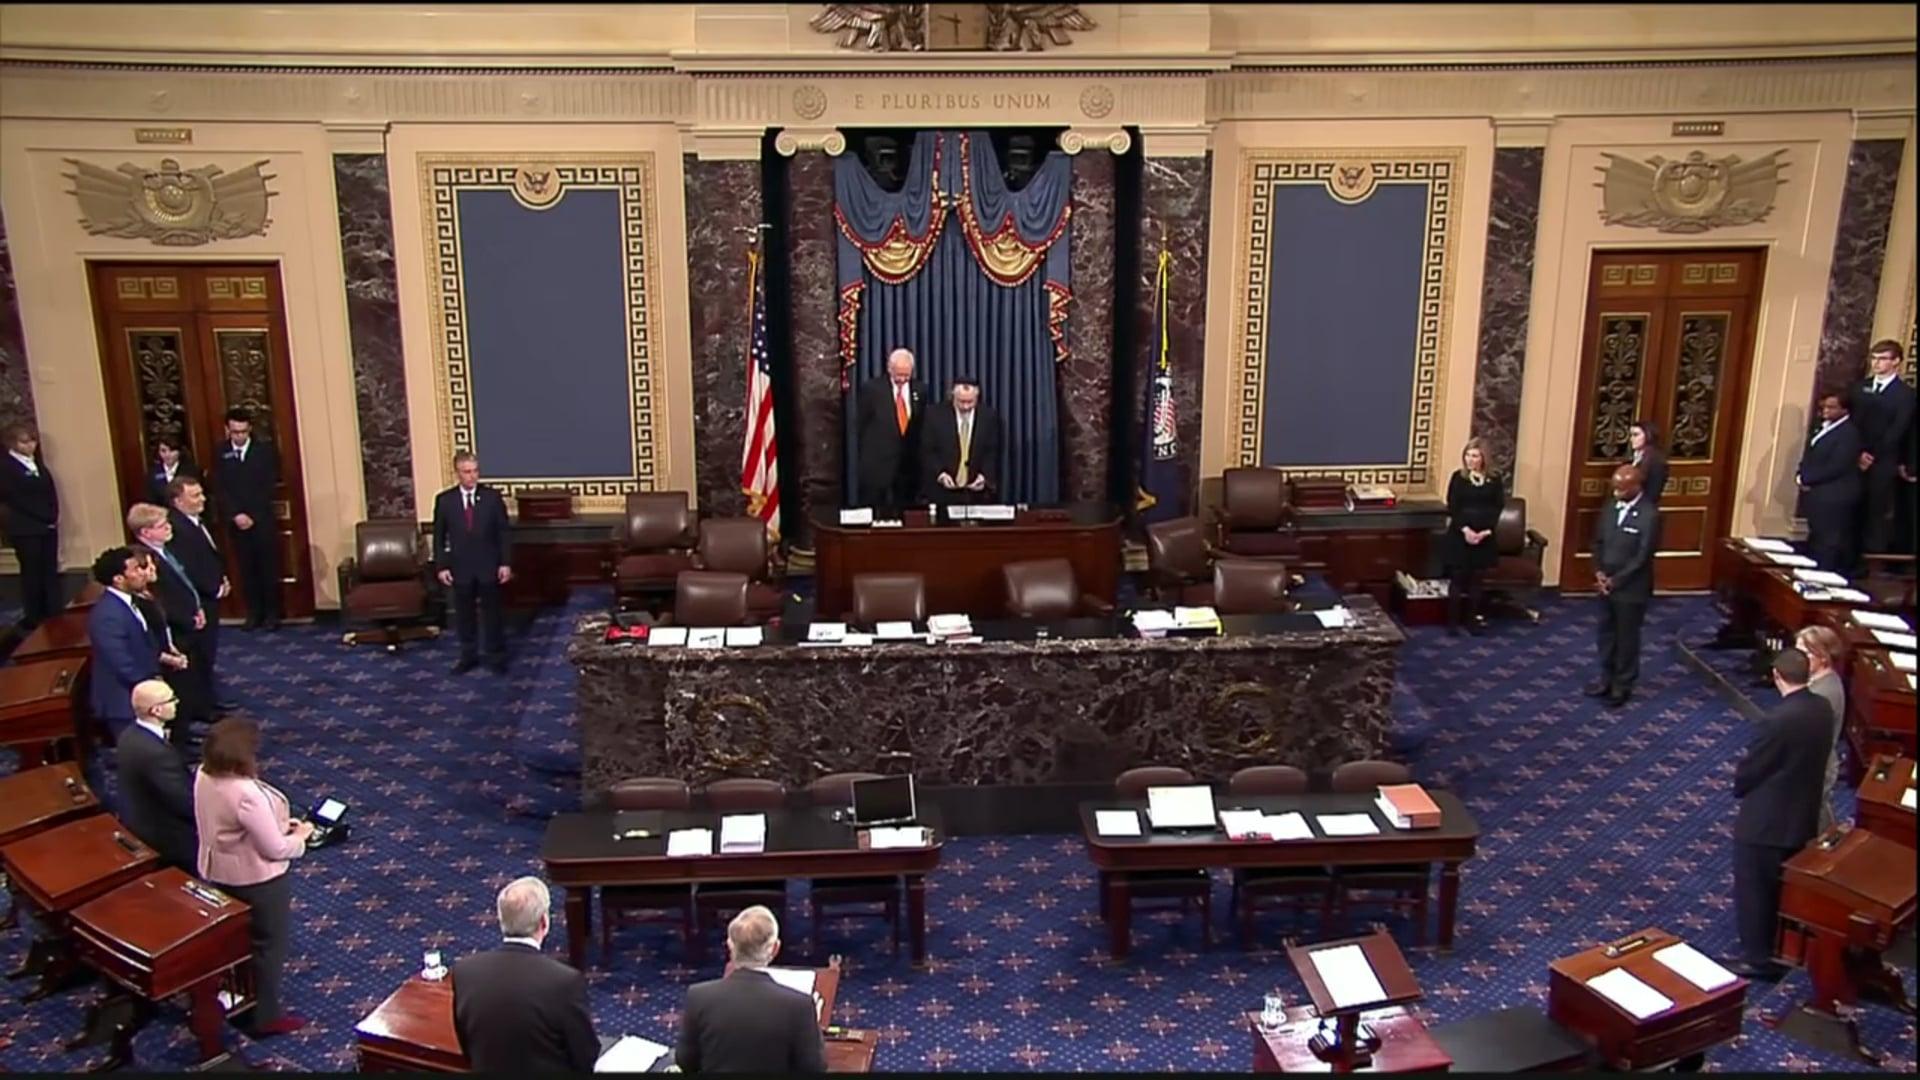 Rabbi Yosef Greenberg Opens Senate With Daily Prayer